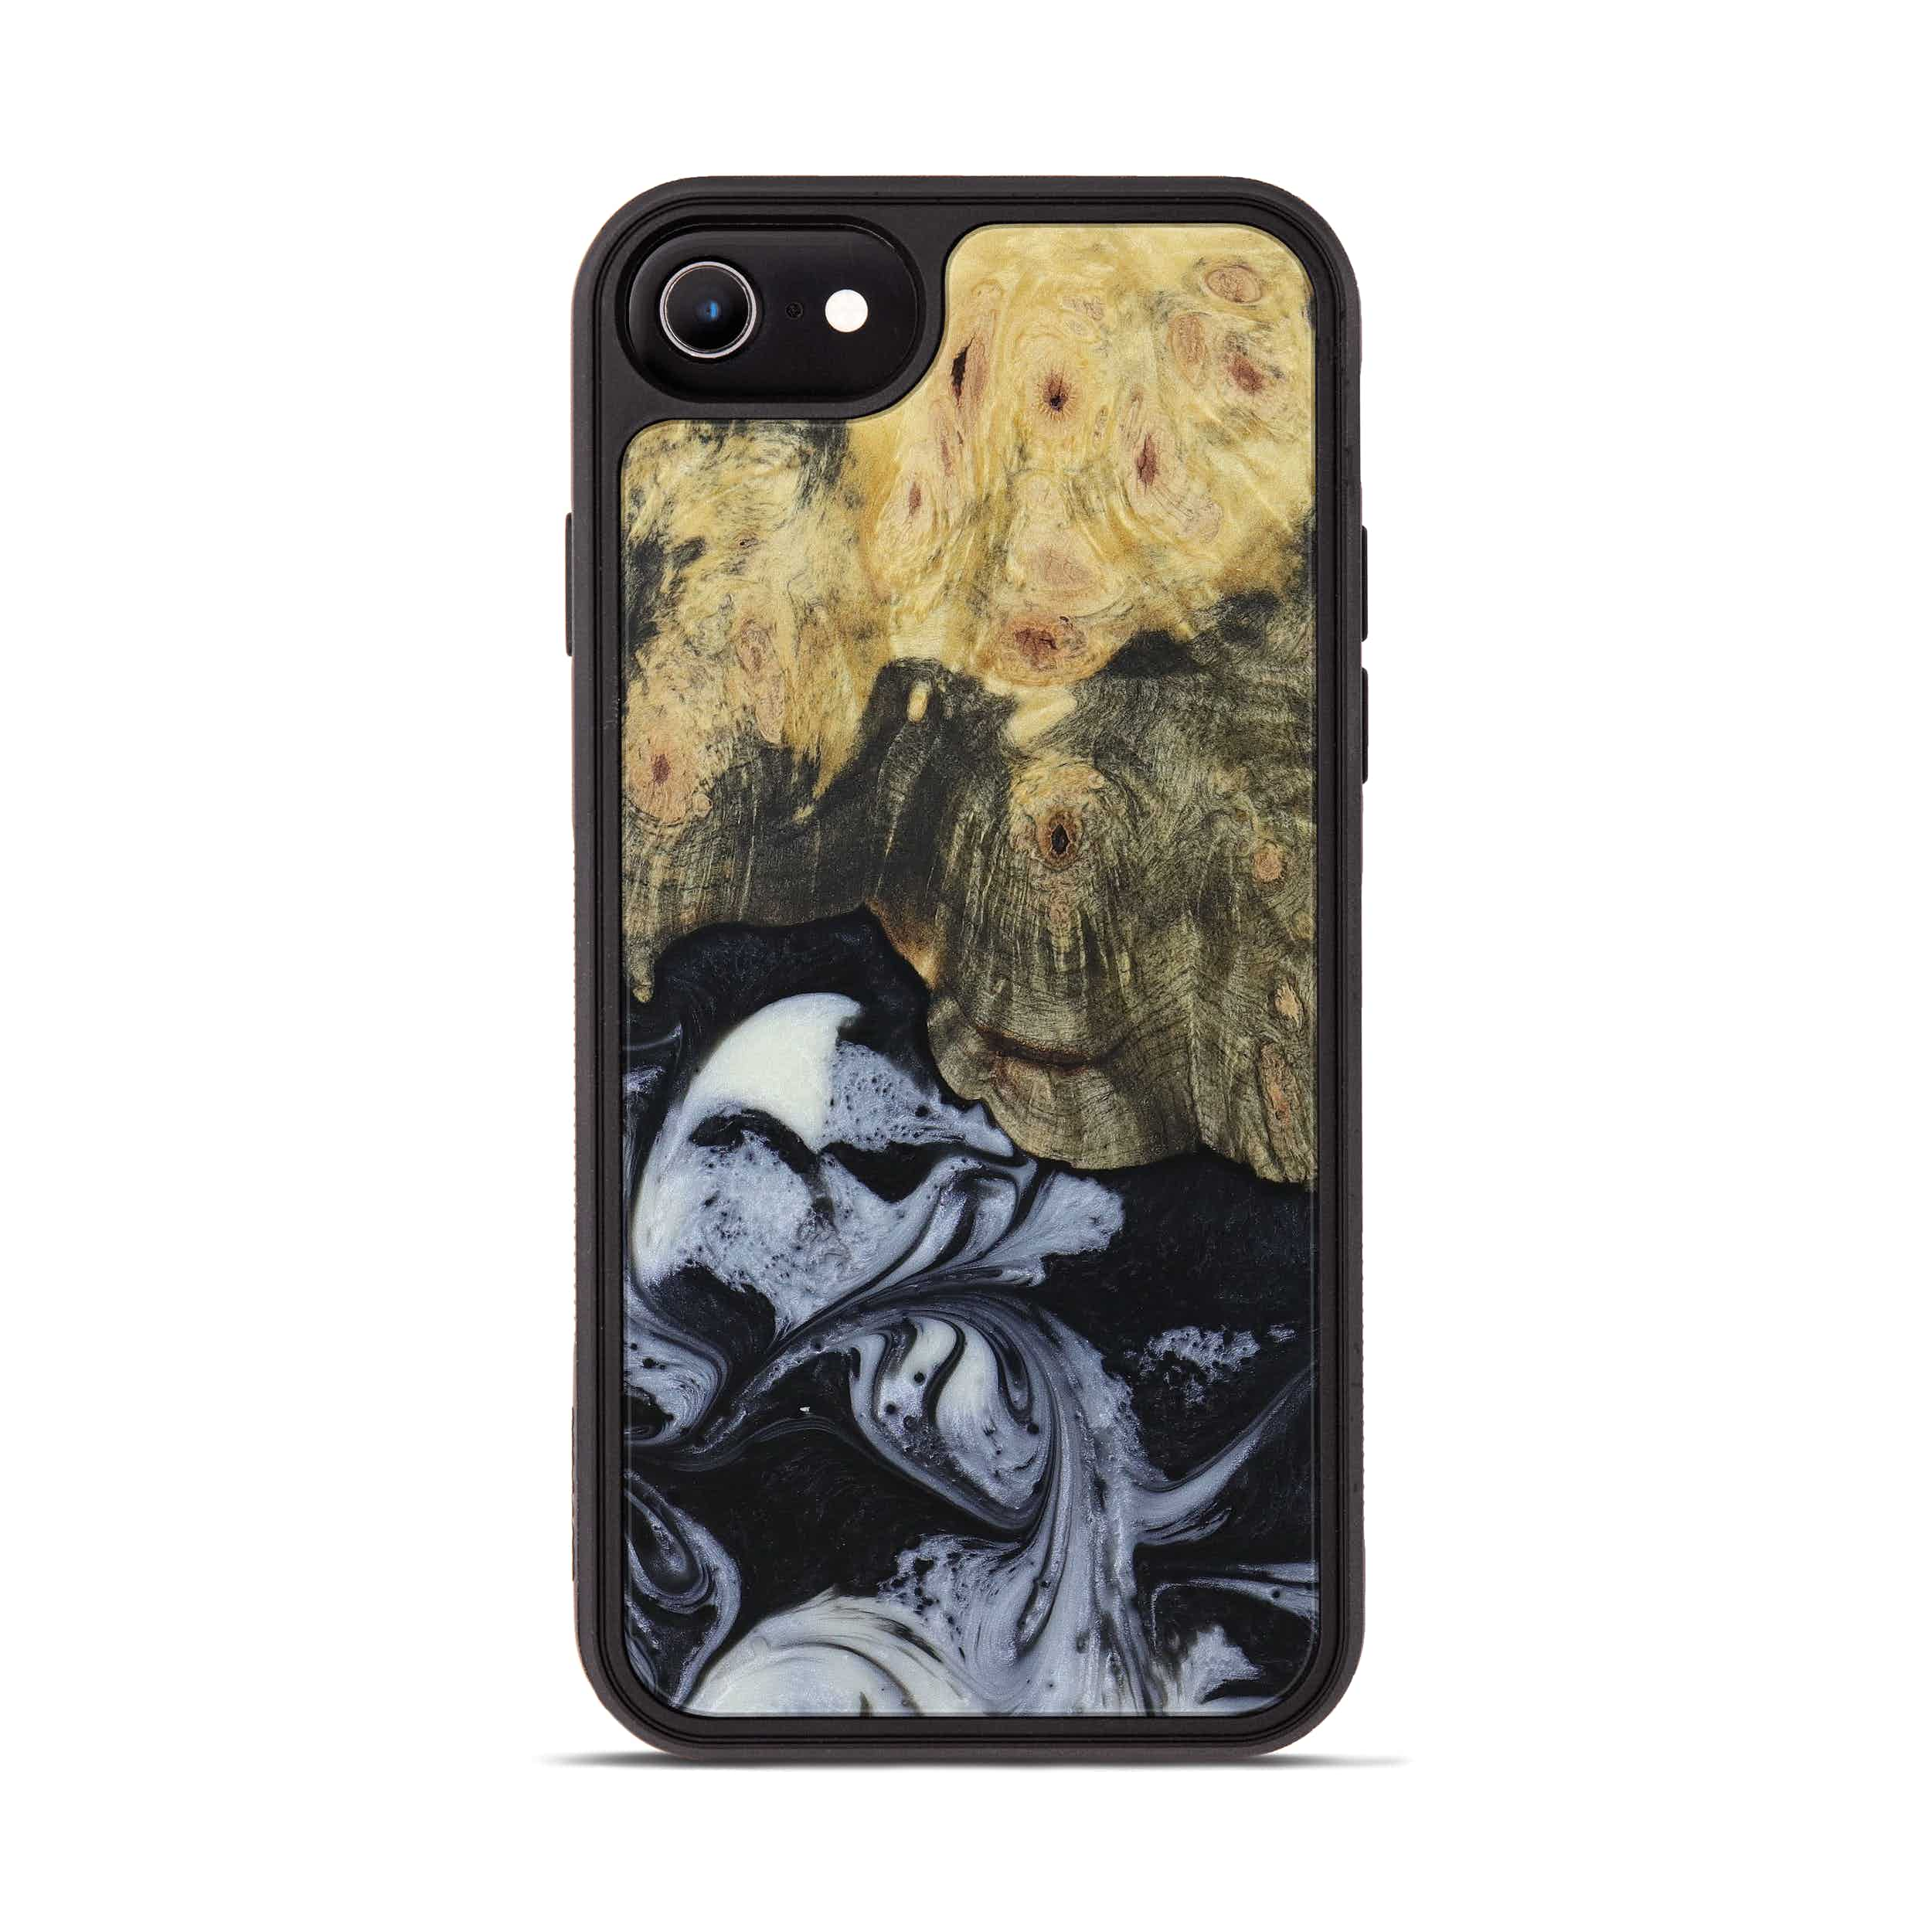 iPhone 6s Wood+Resin Phone Case - Rosalinda (Black & White, 397919)